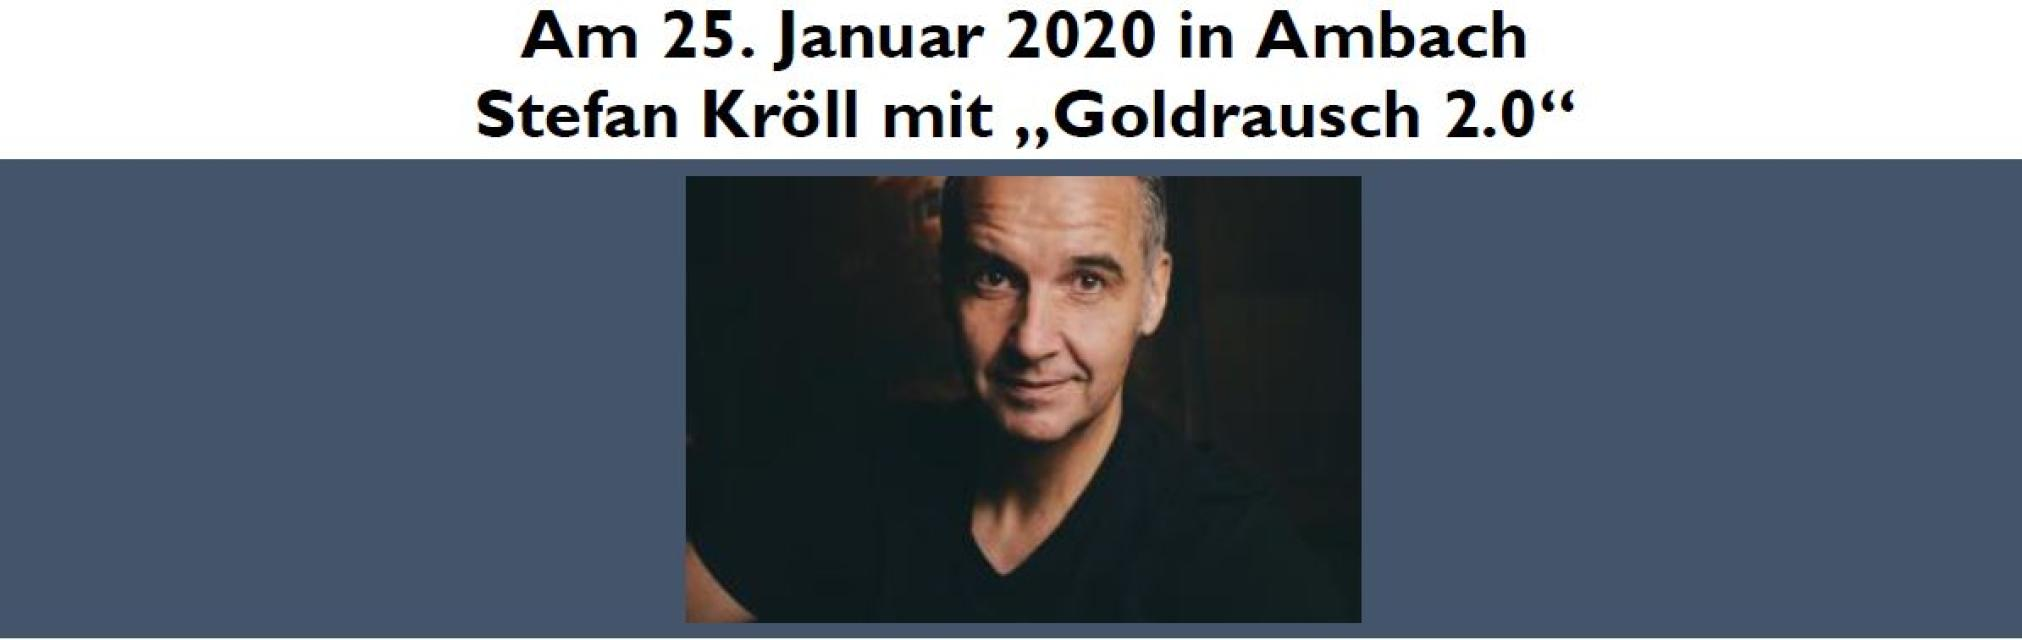 - KleinKunst & Kultur